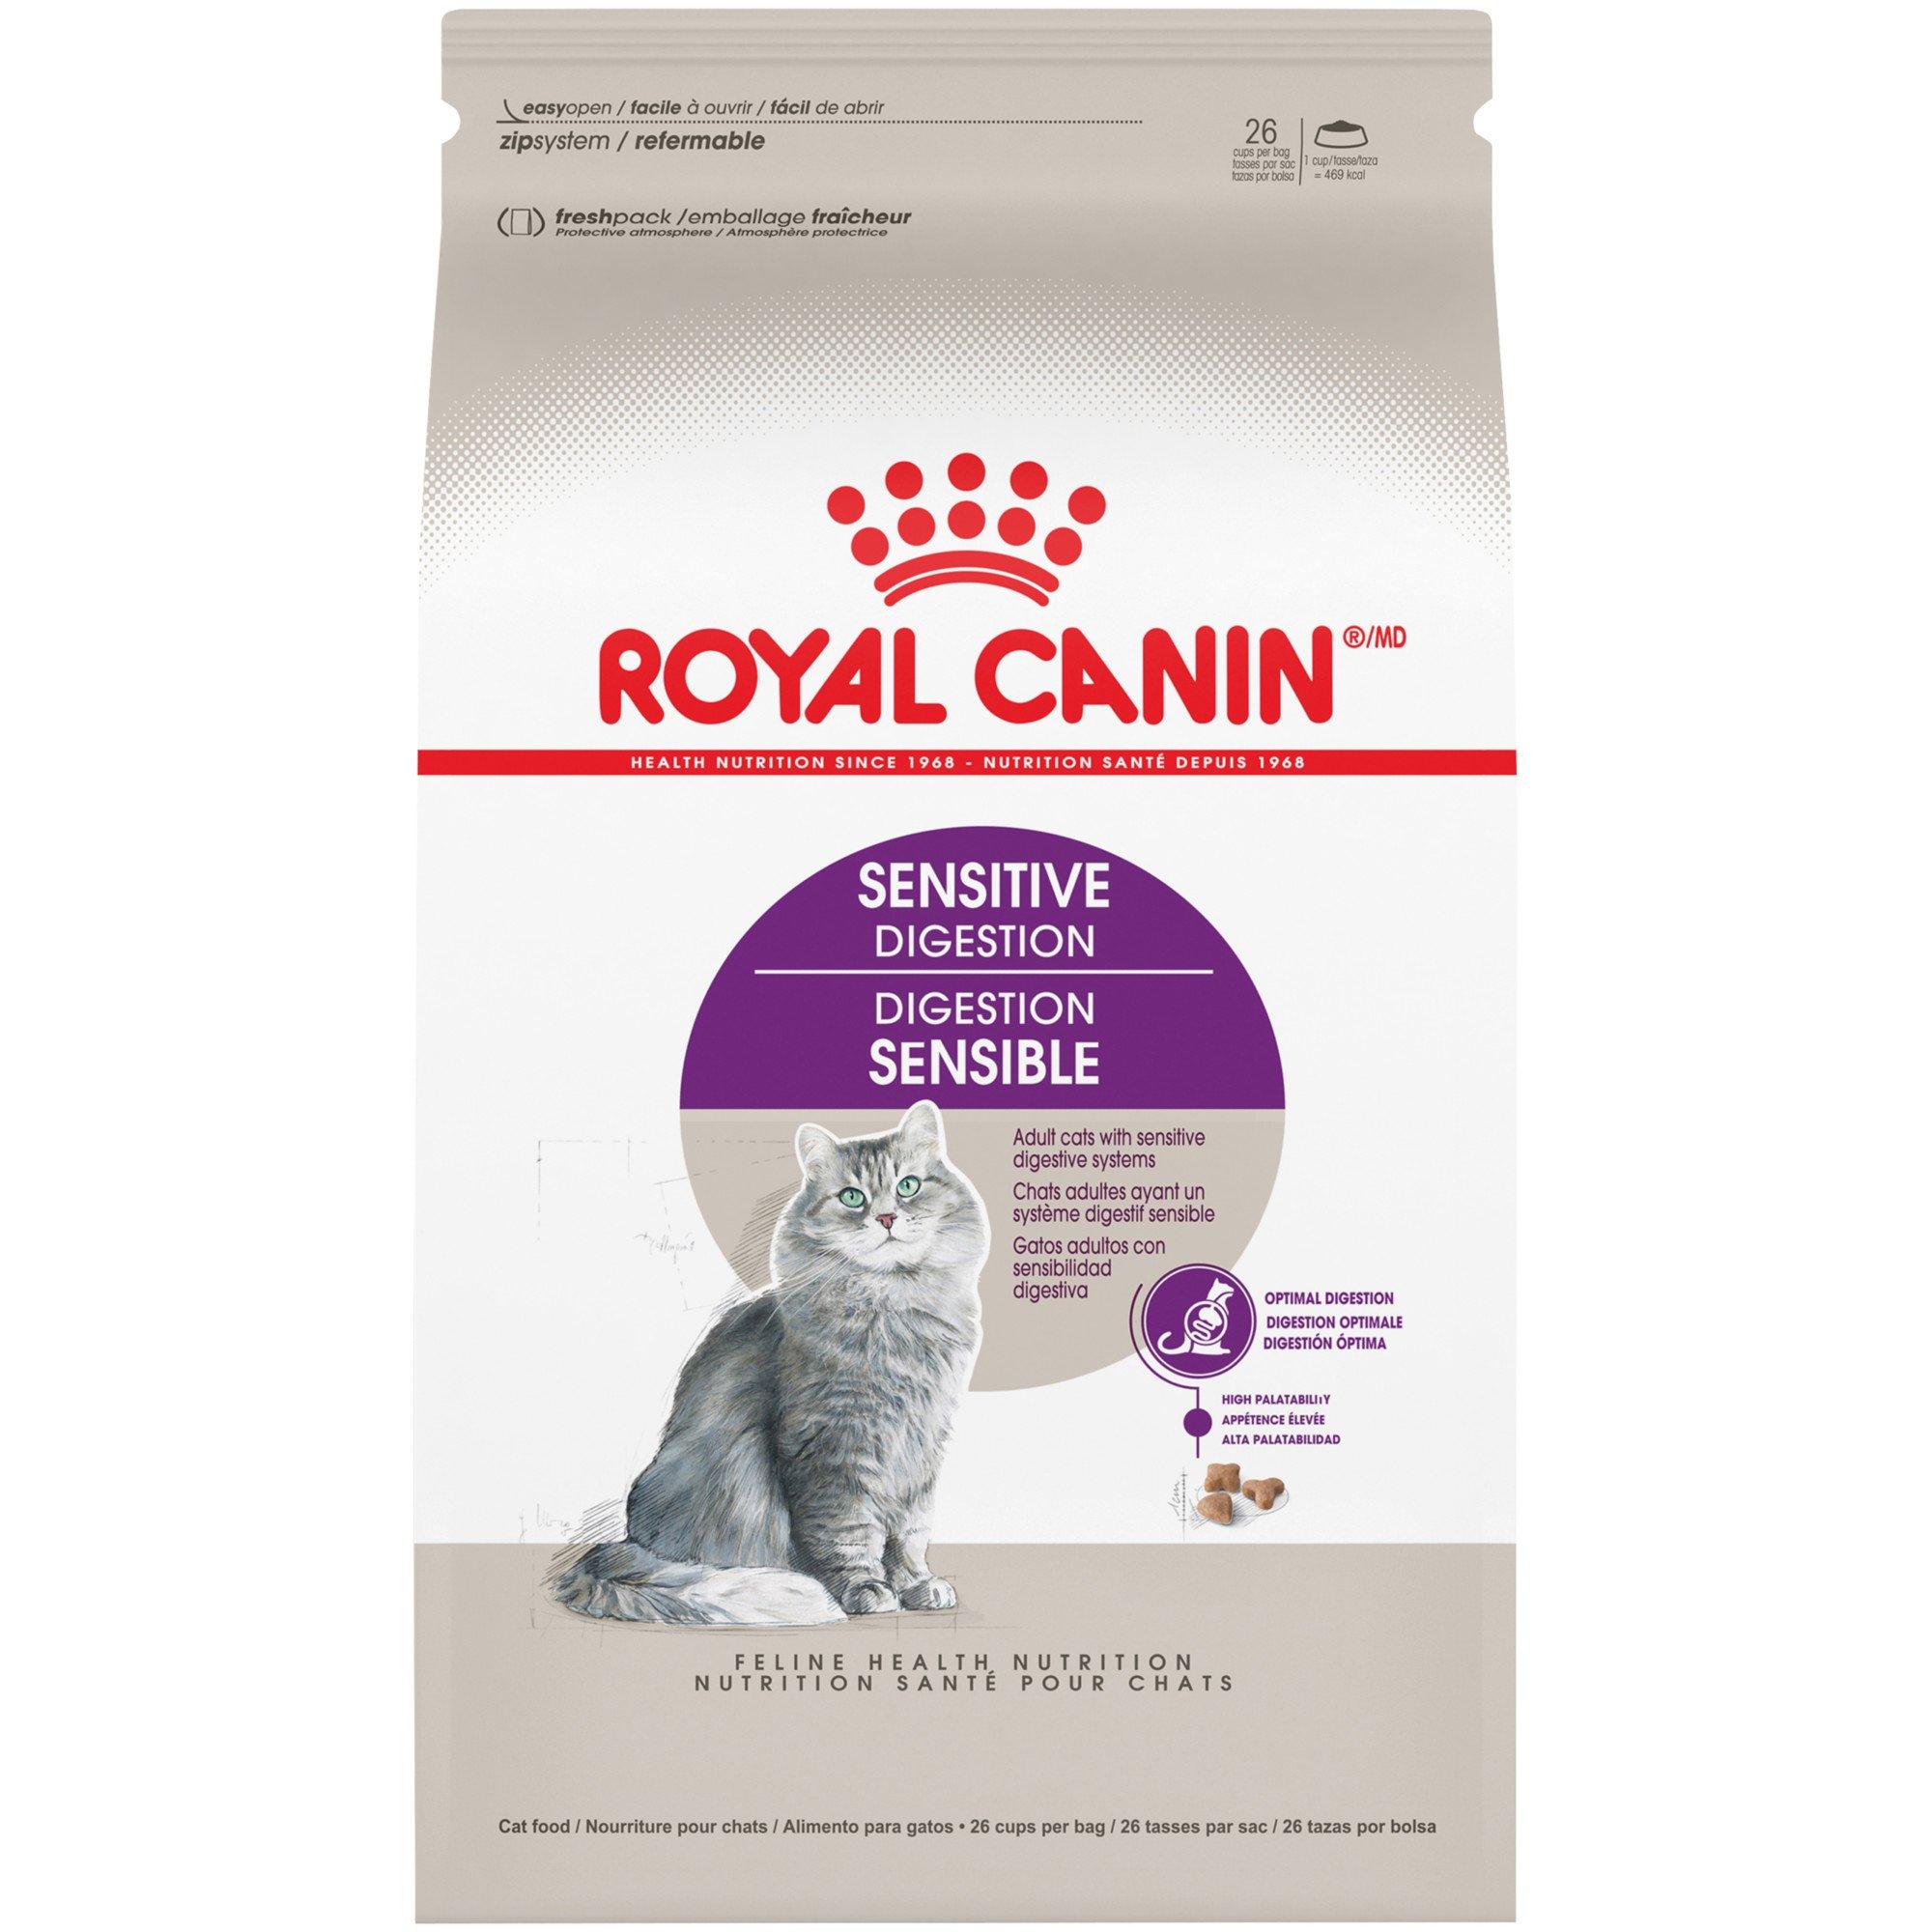 Royal Canin Feline Health Nutrition Special  Dry Cat Food